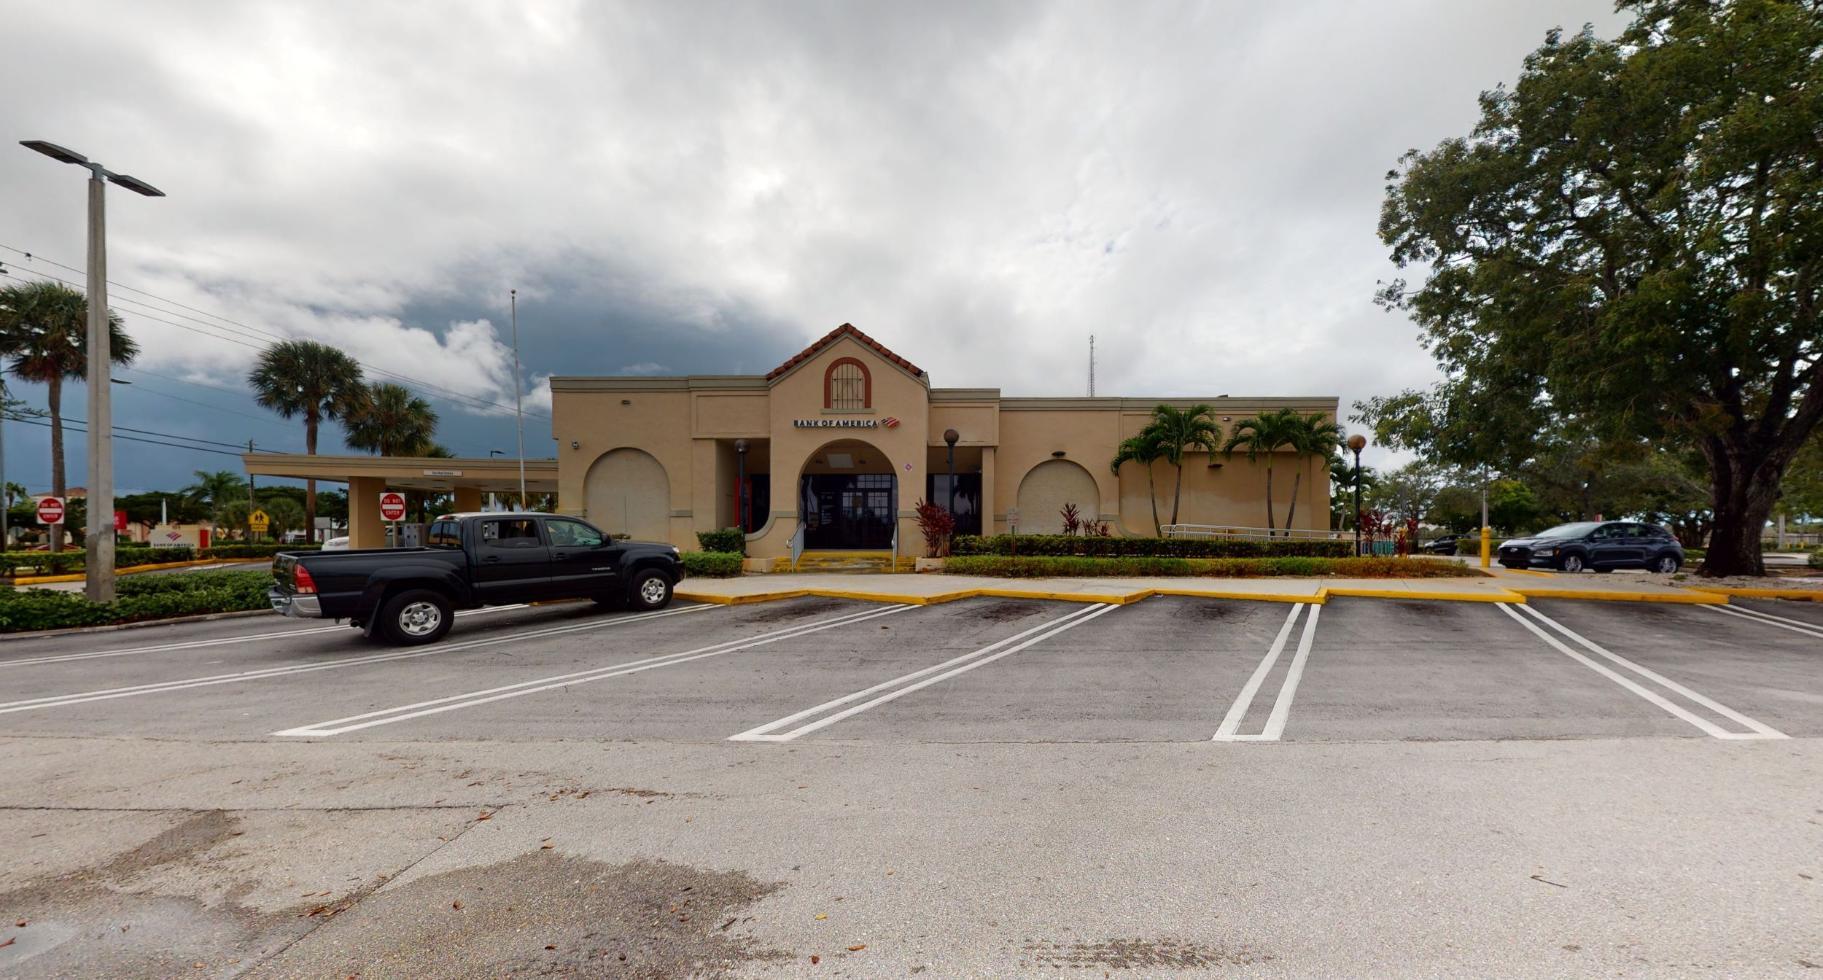 Bank of America financial center with drive-thru ATM   105 N Congress Ave, Boynton Beach, FL 33426